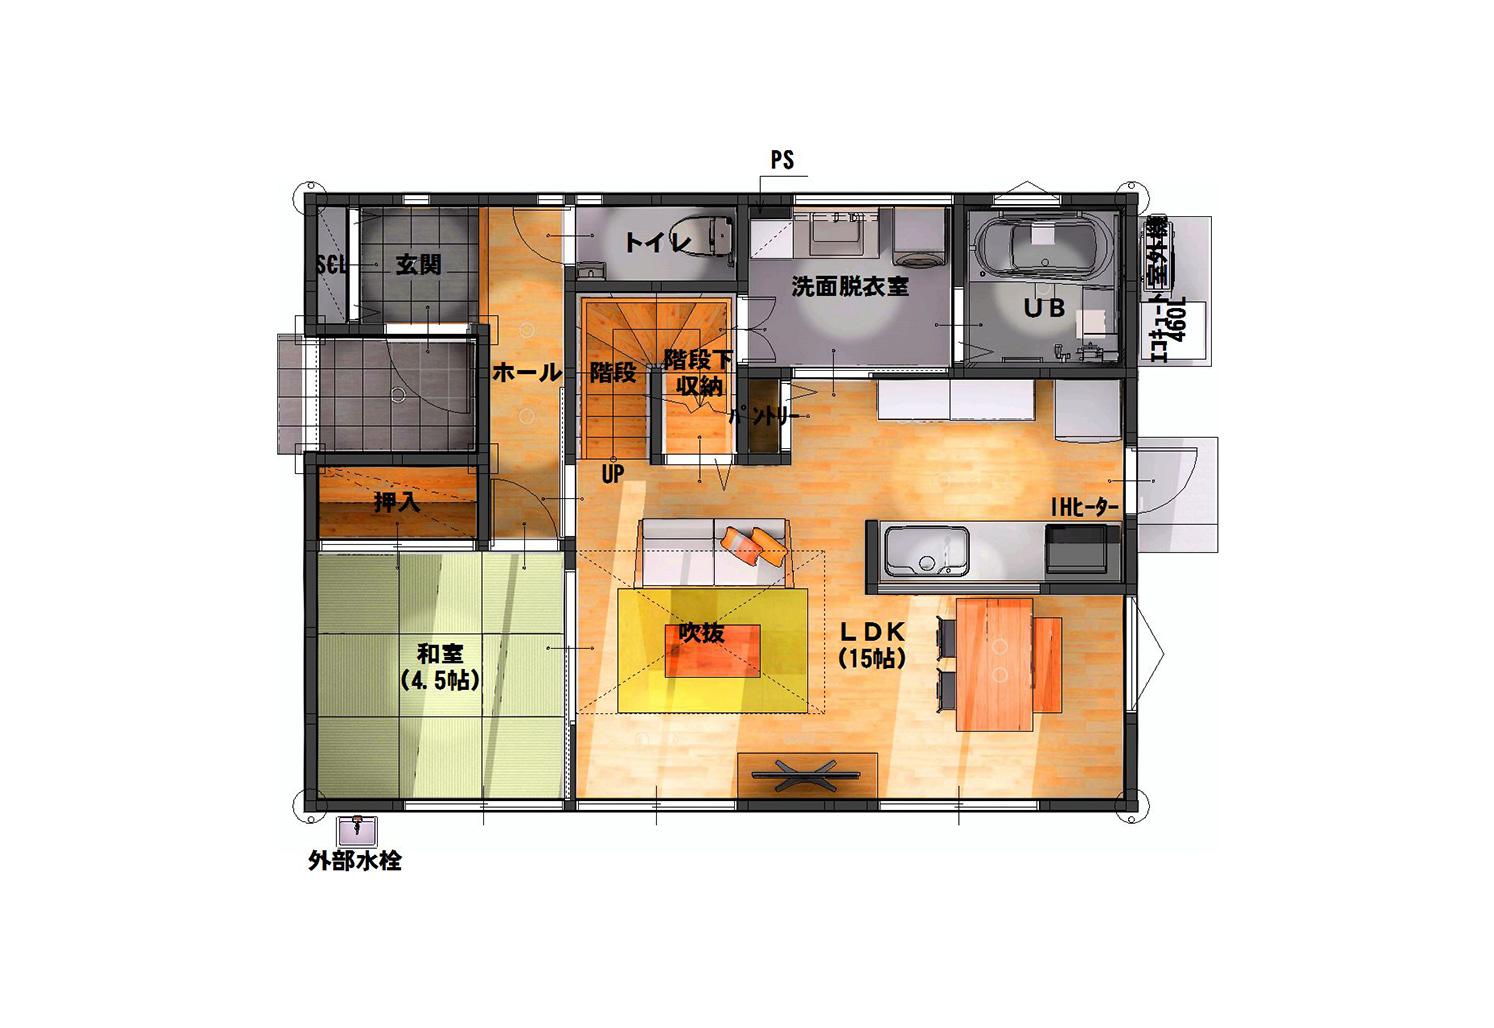 03 宮城県岩沼市吹上一丁目 3LDK (4LDKに変更可) 間取り図 1階